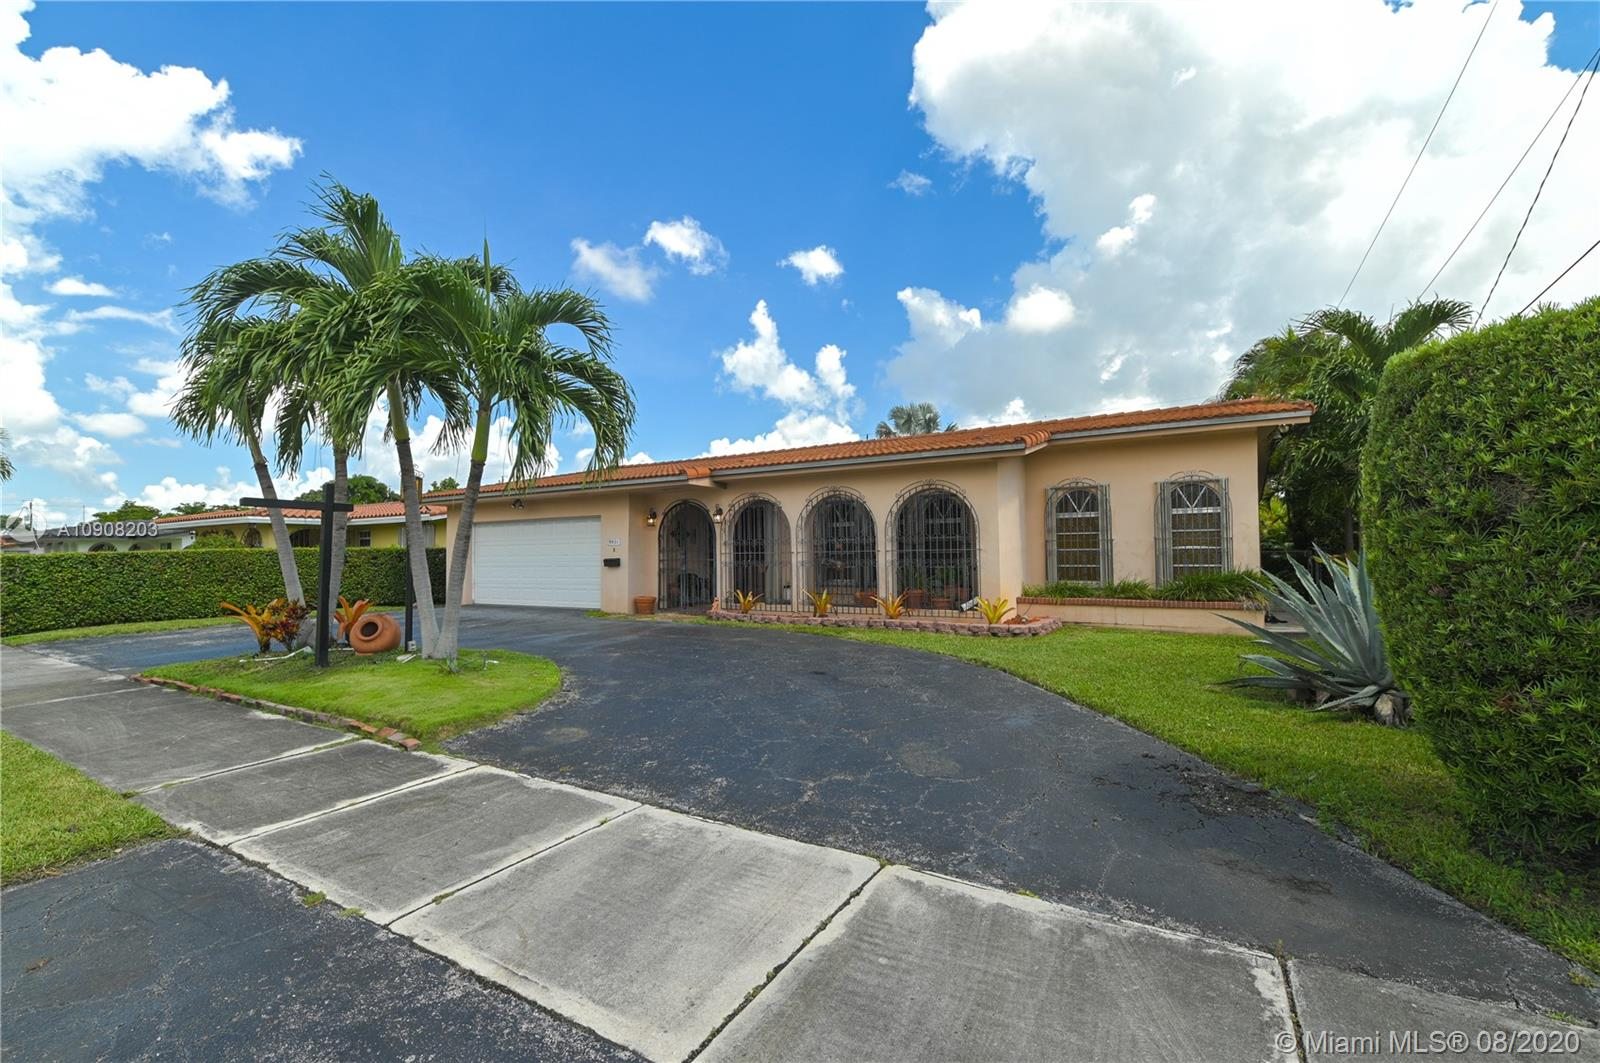 9931 SW 23rd St, Miami FL 33165